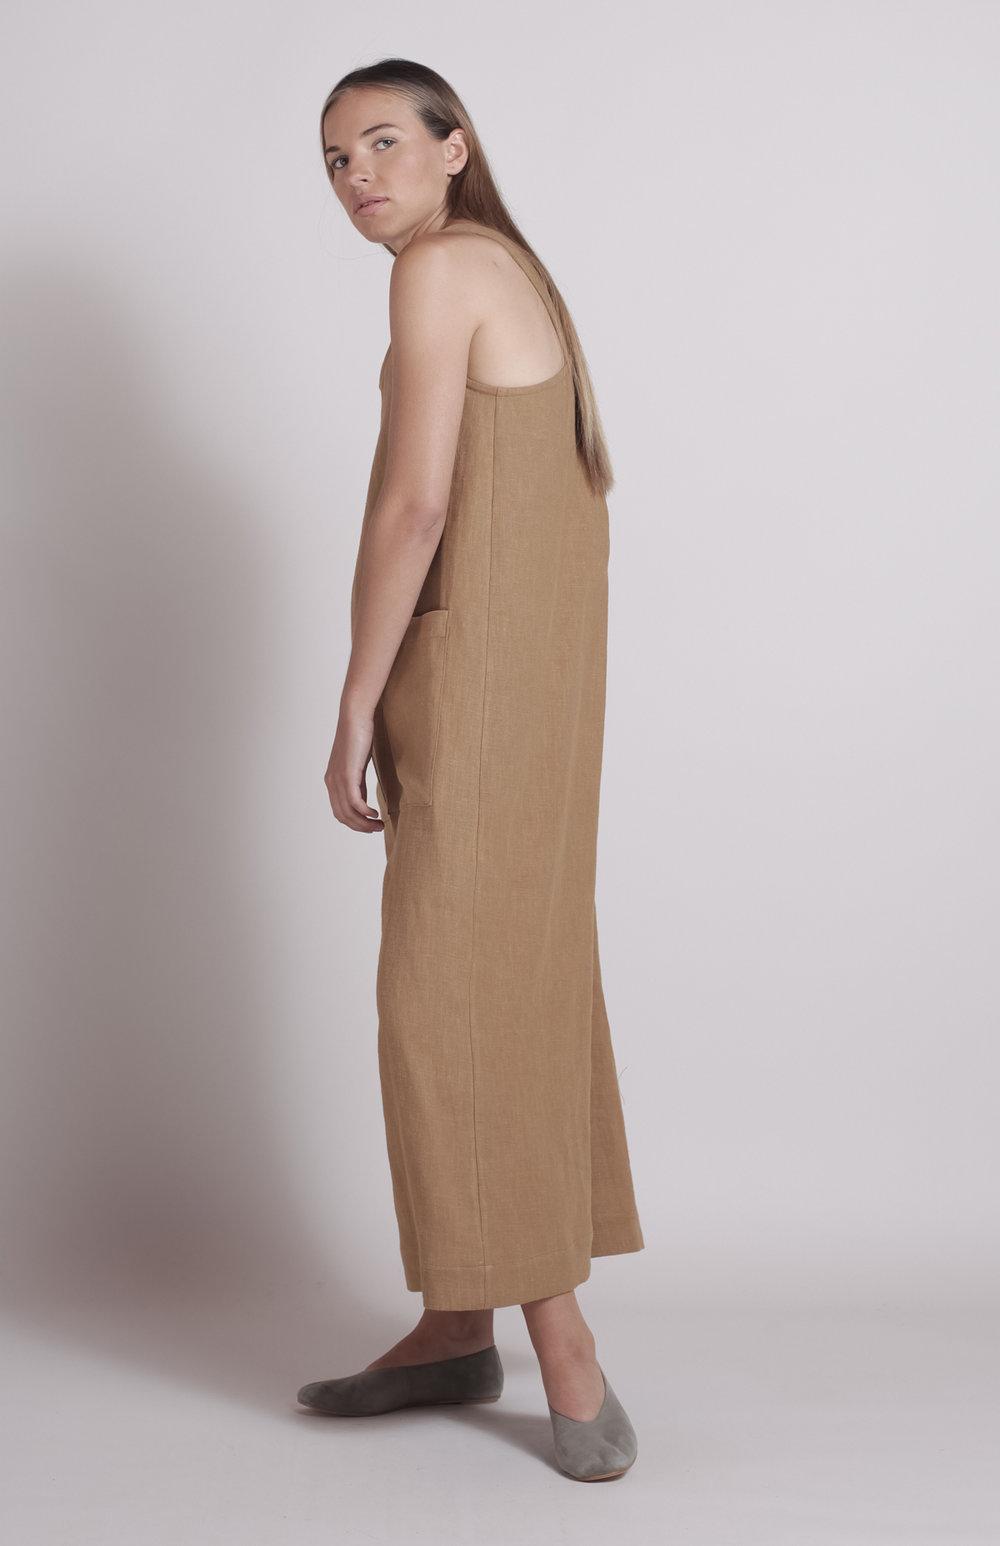 Soro soro Overalls - Linen / Cotton